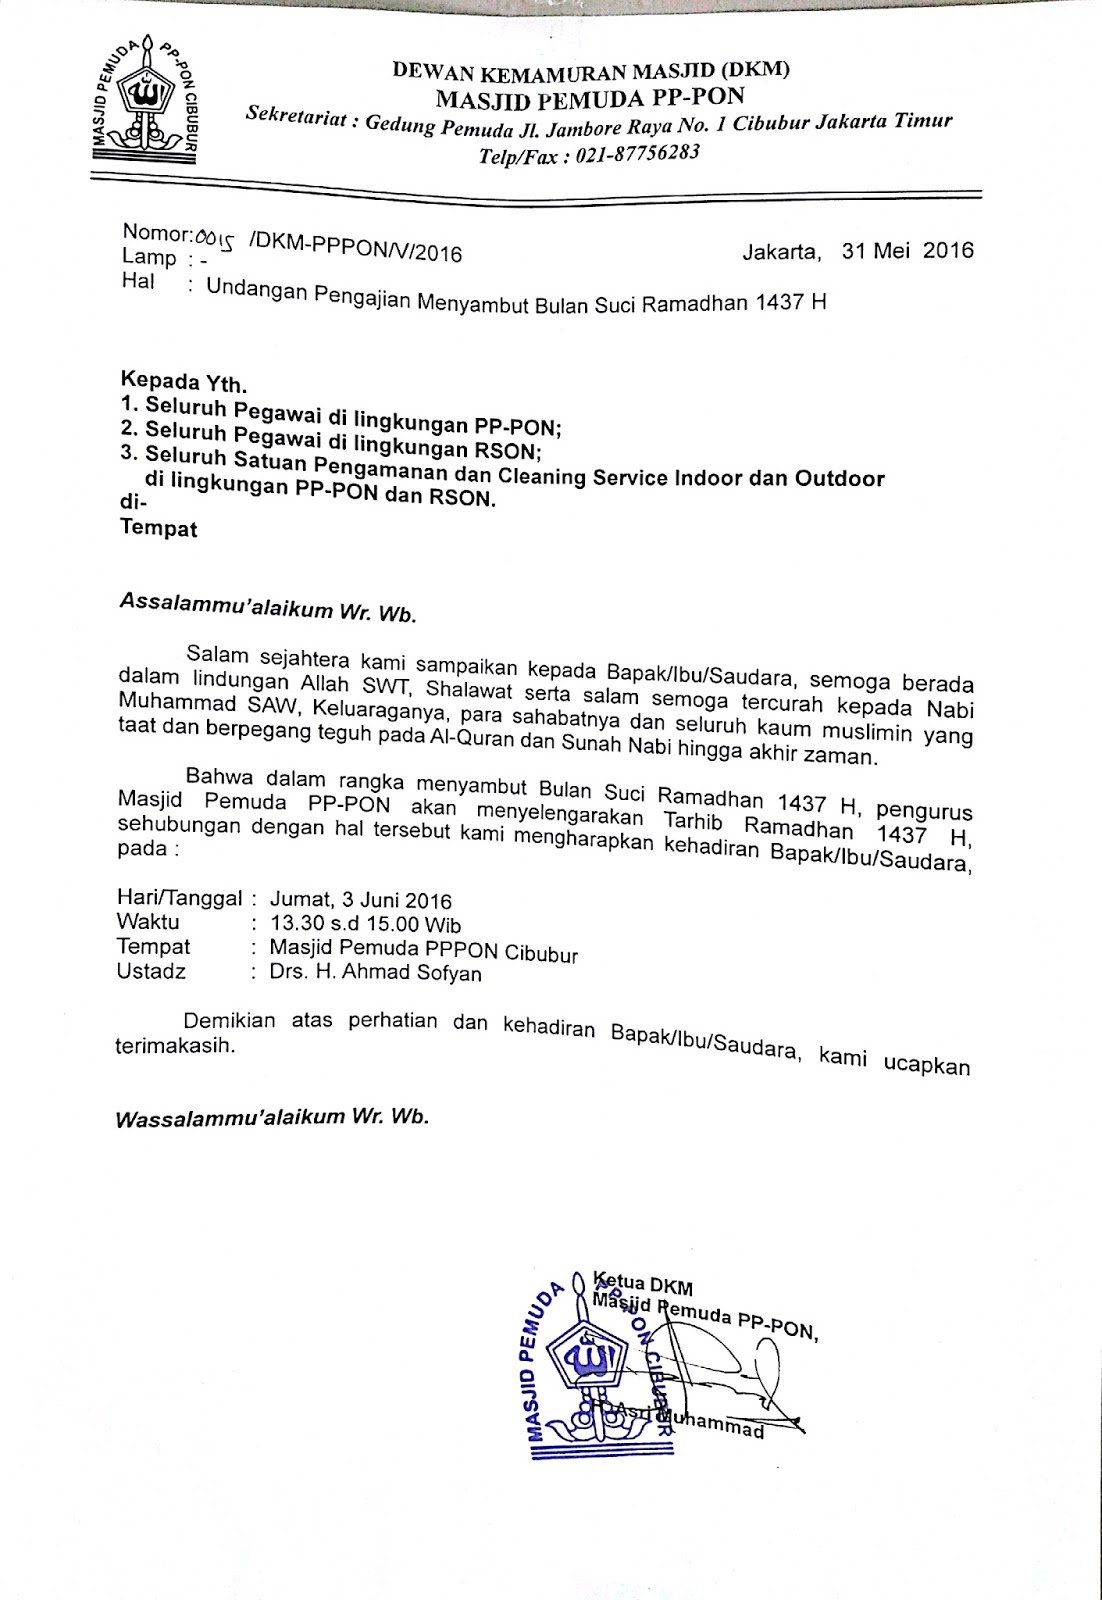 Contoh Surat Undangan Pengajian Tarhib Ramadhan Brankas Arsip